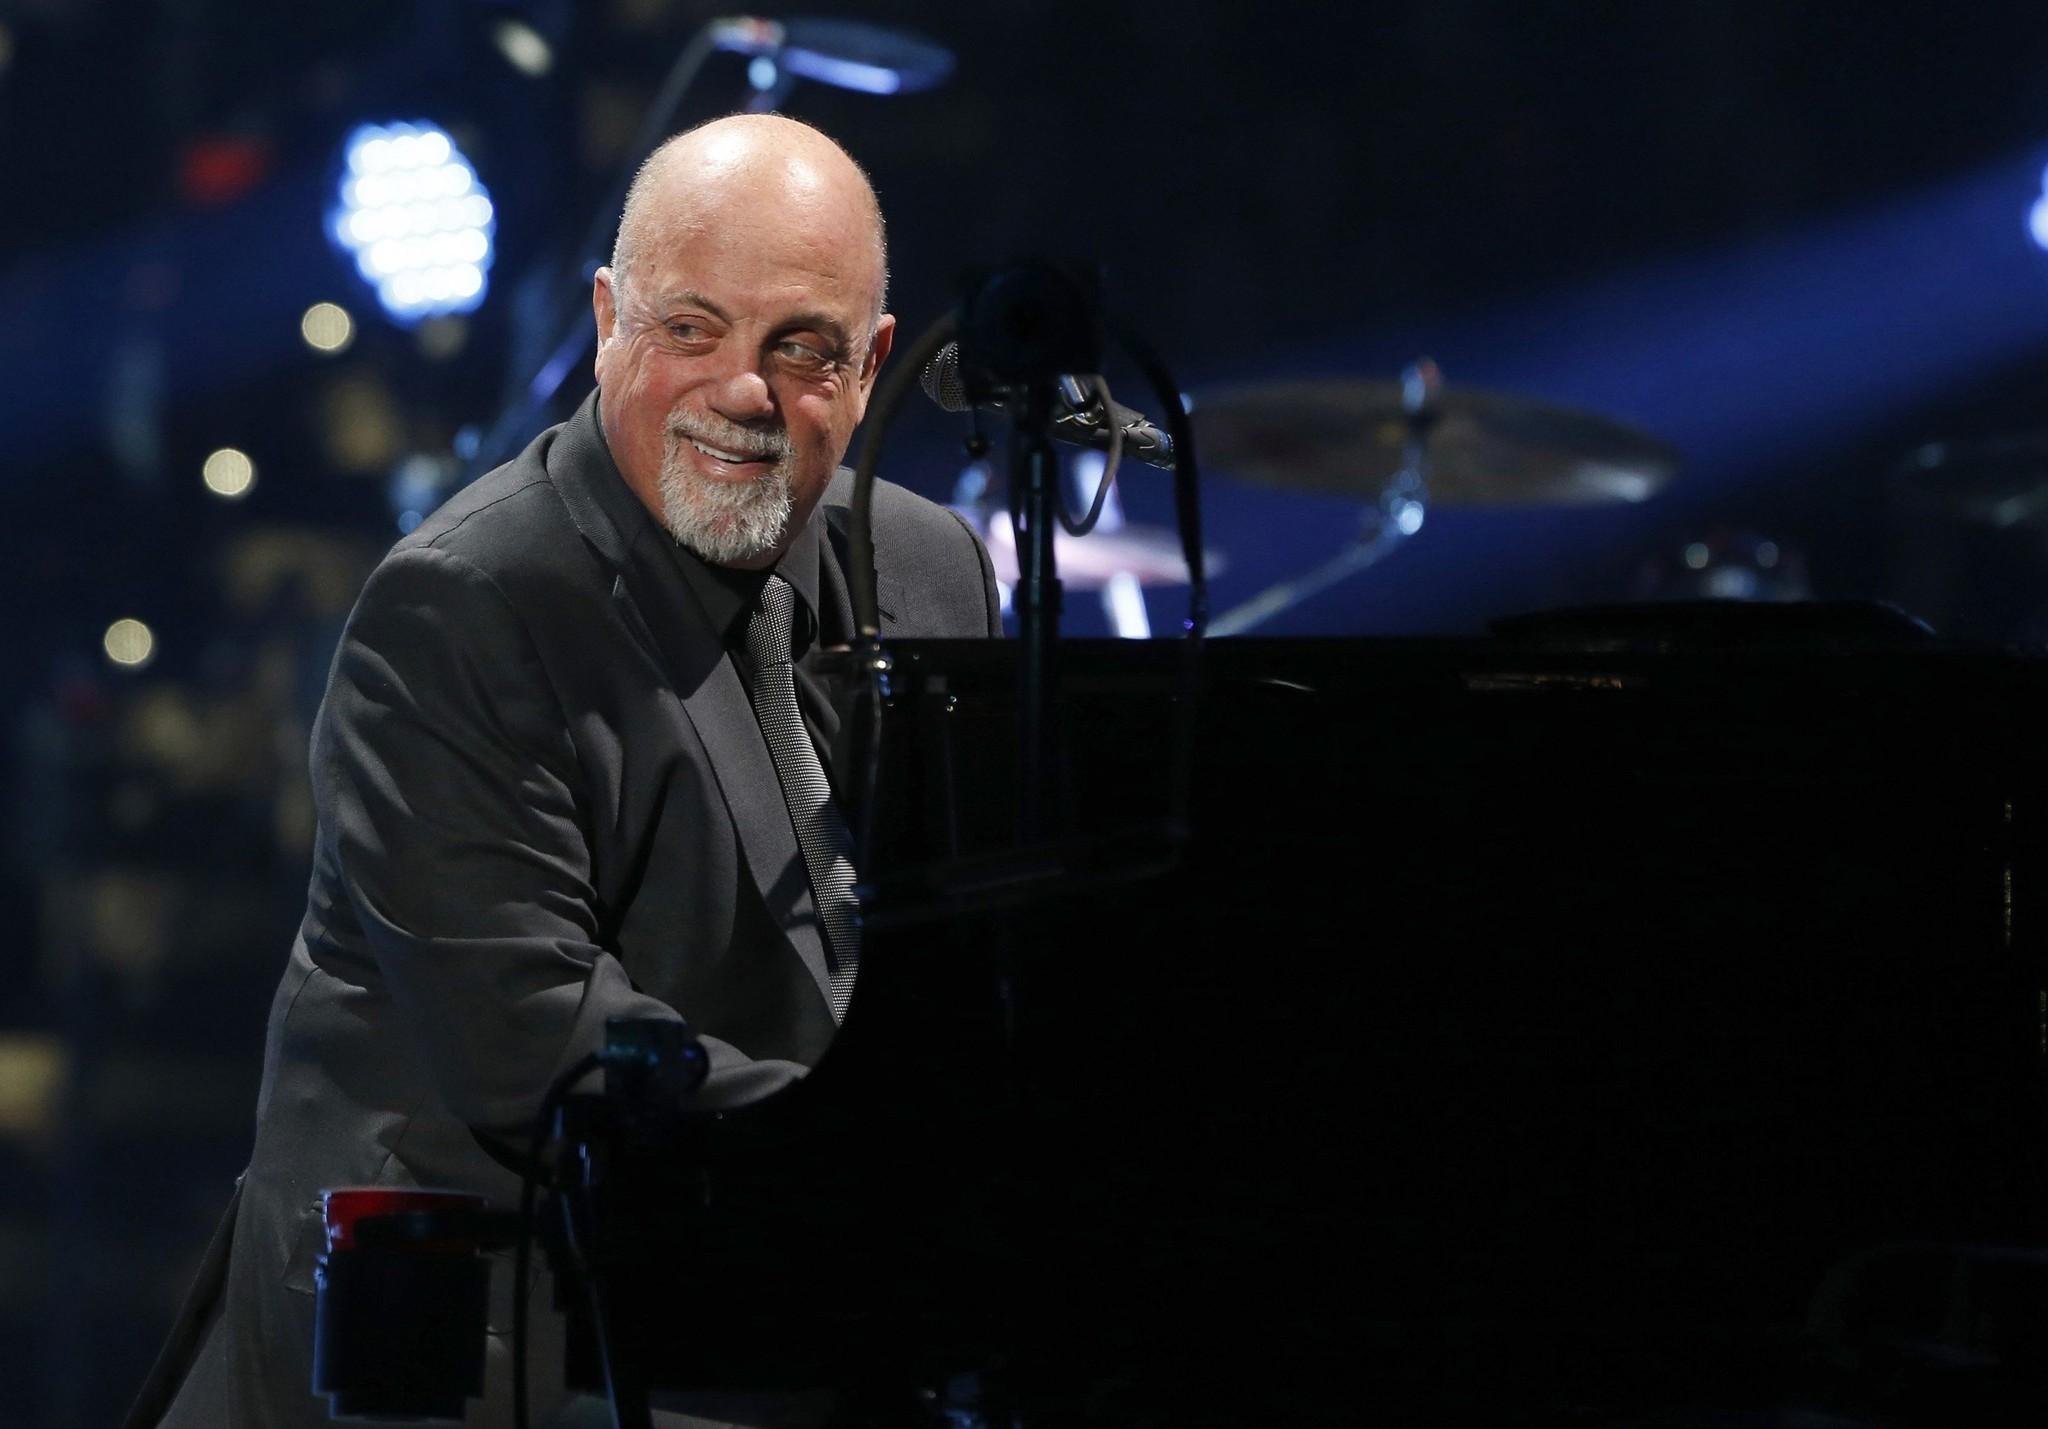 Billy Joel New Years Eve